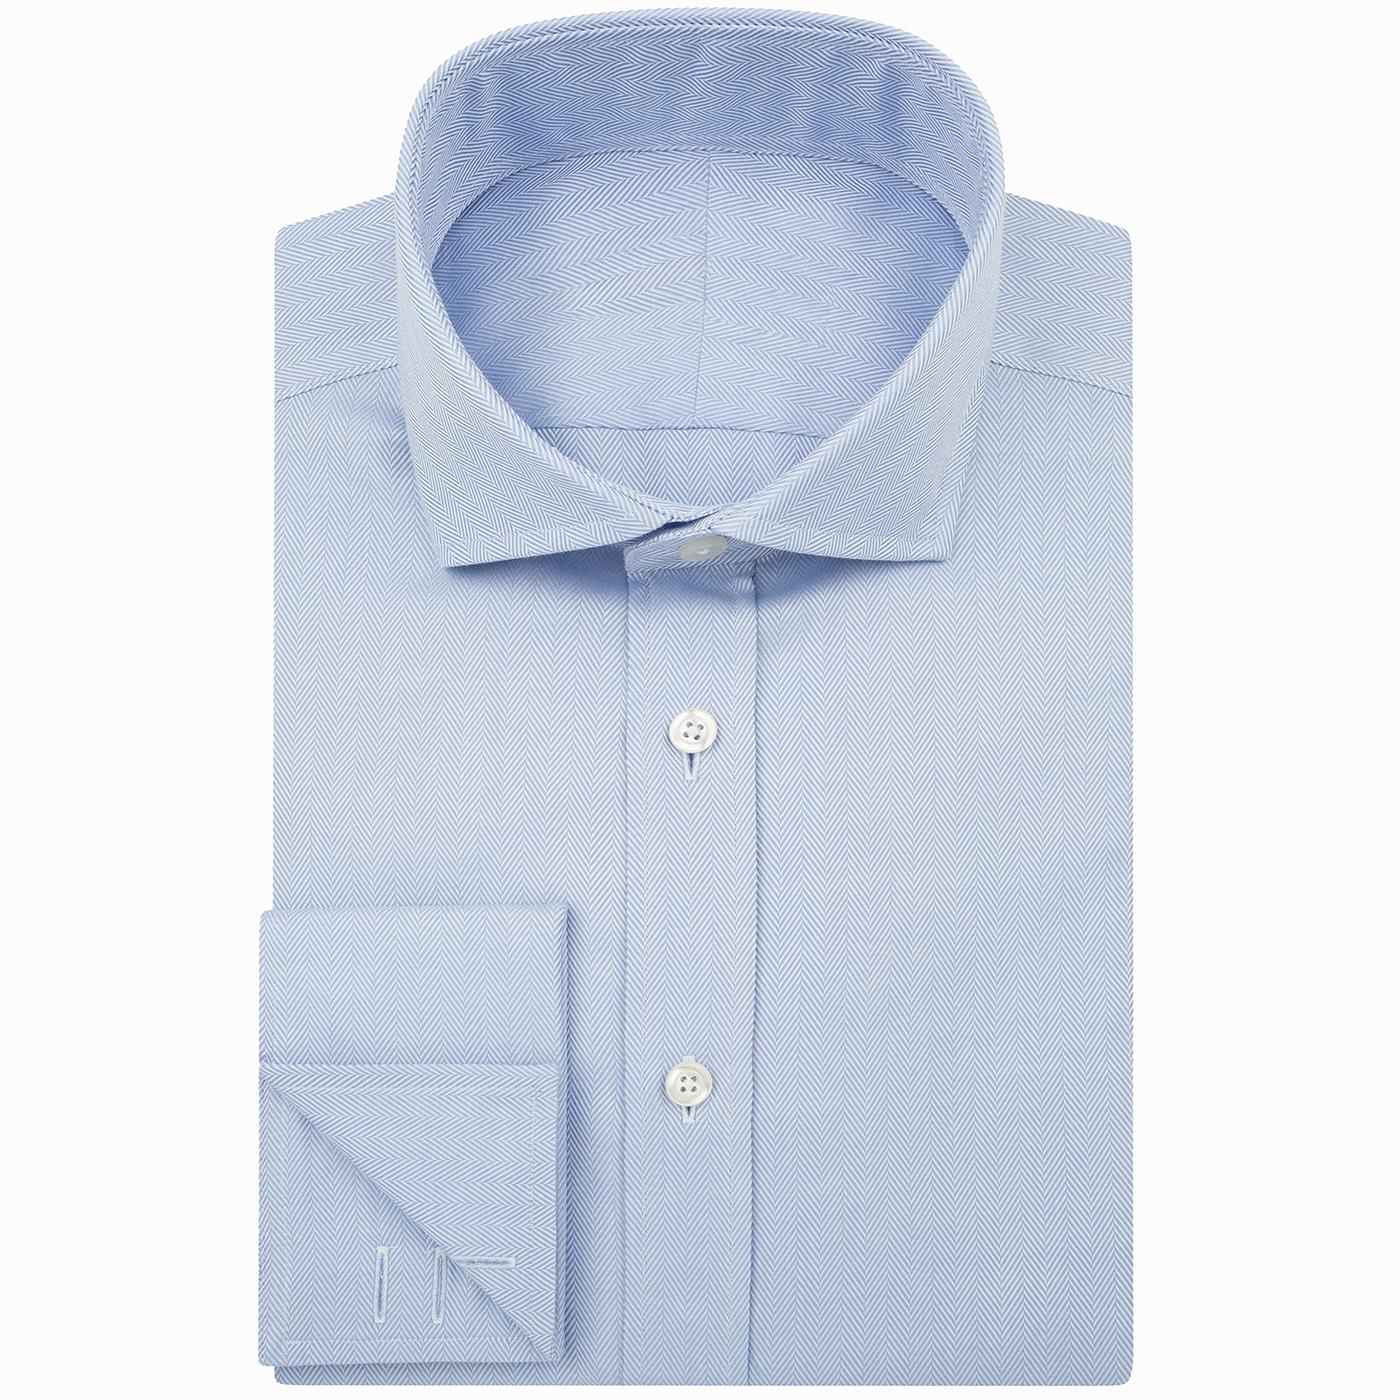 Shirt_18_Royal-herringbone_blue.jpg